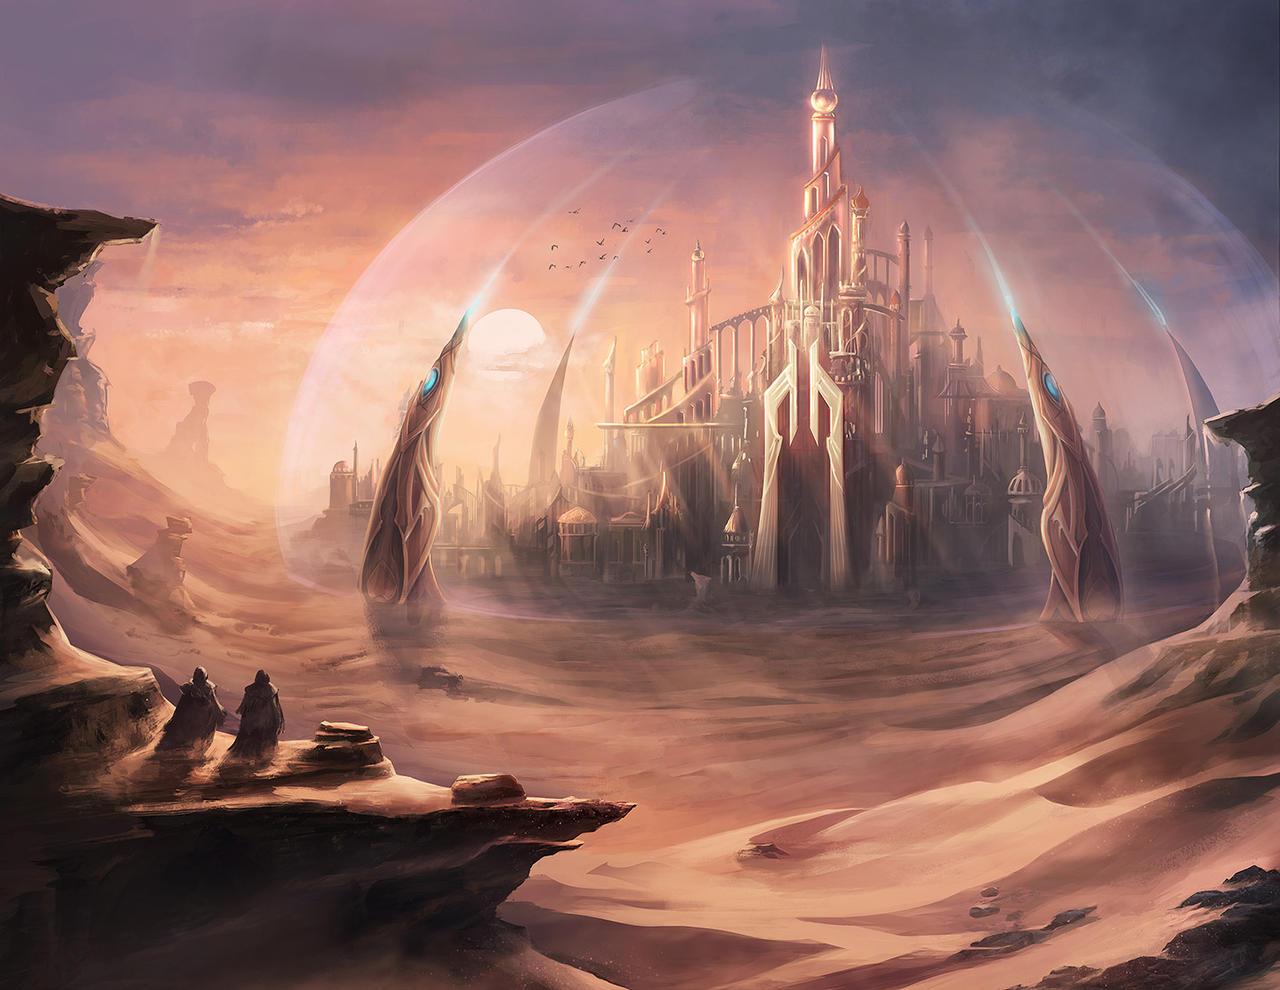 Desert City by mrainbowwj